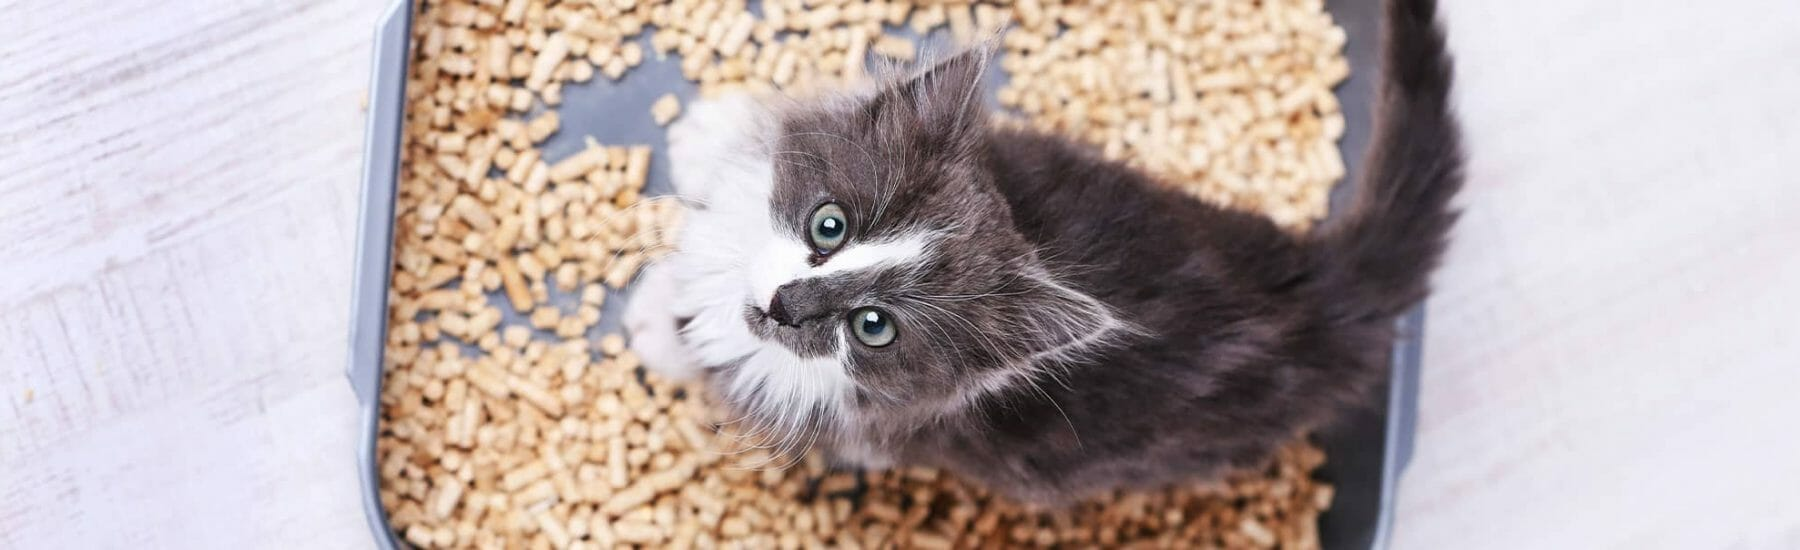 Cat standing in a litter box